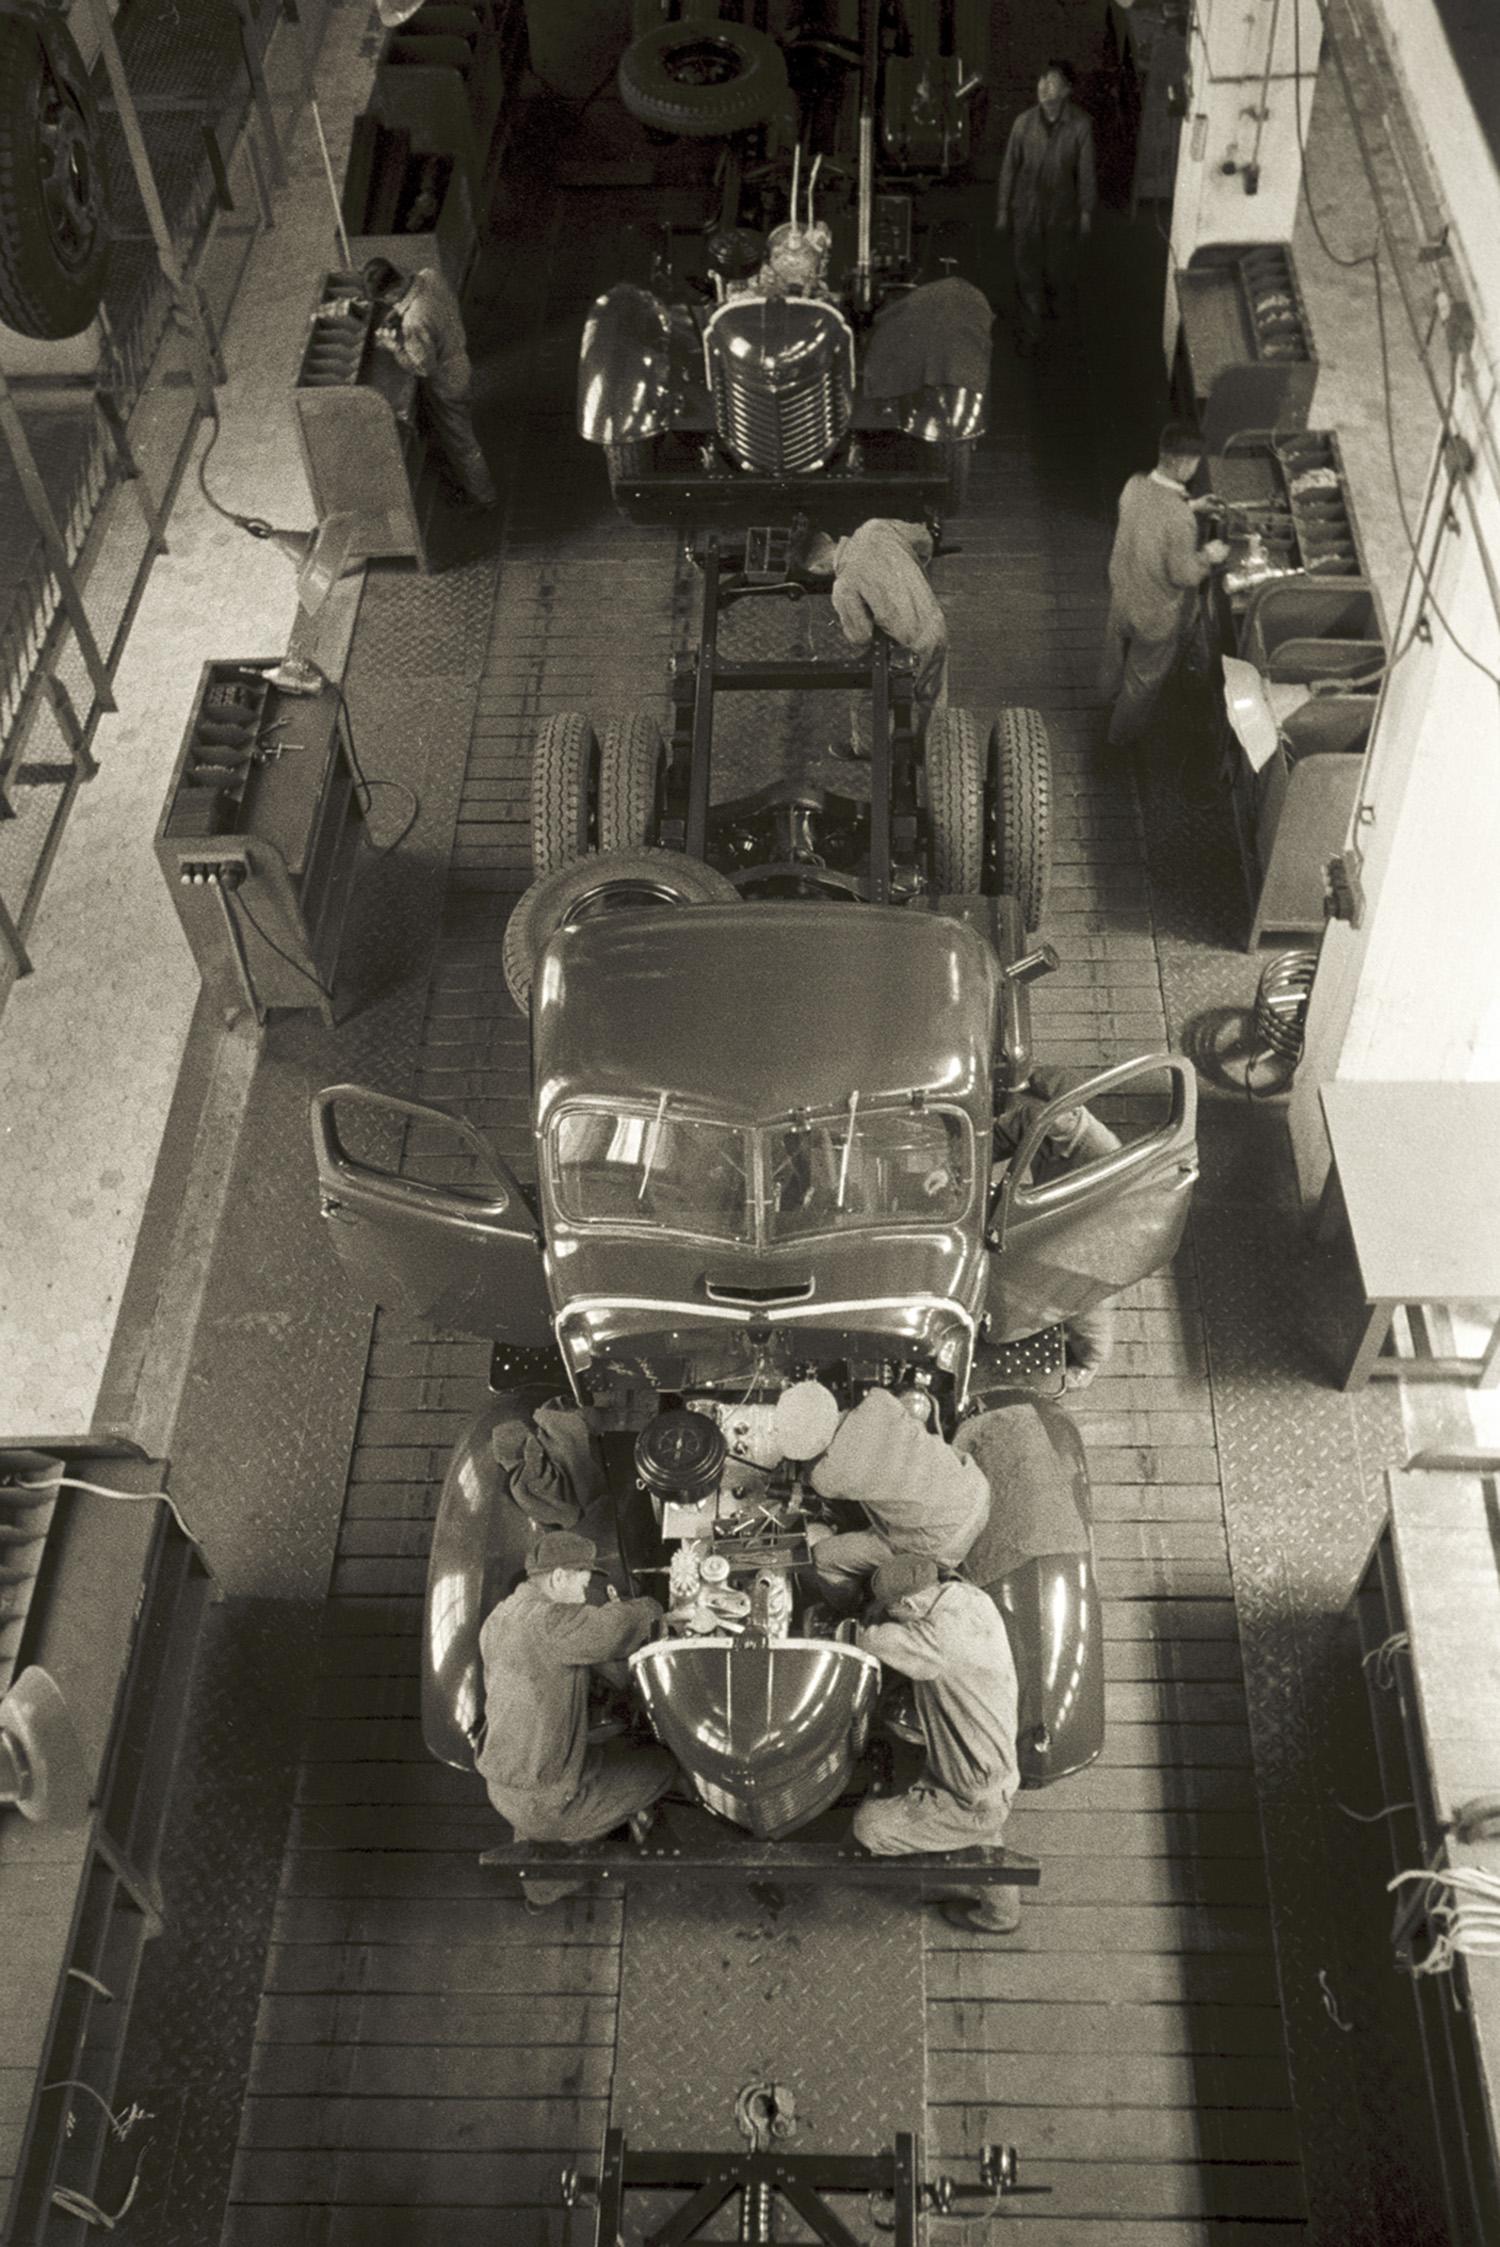 长春汽车制造厂, Changchun Automobile Works, 1959 / Courtesy of Jin Hua